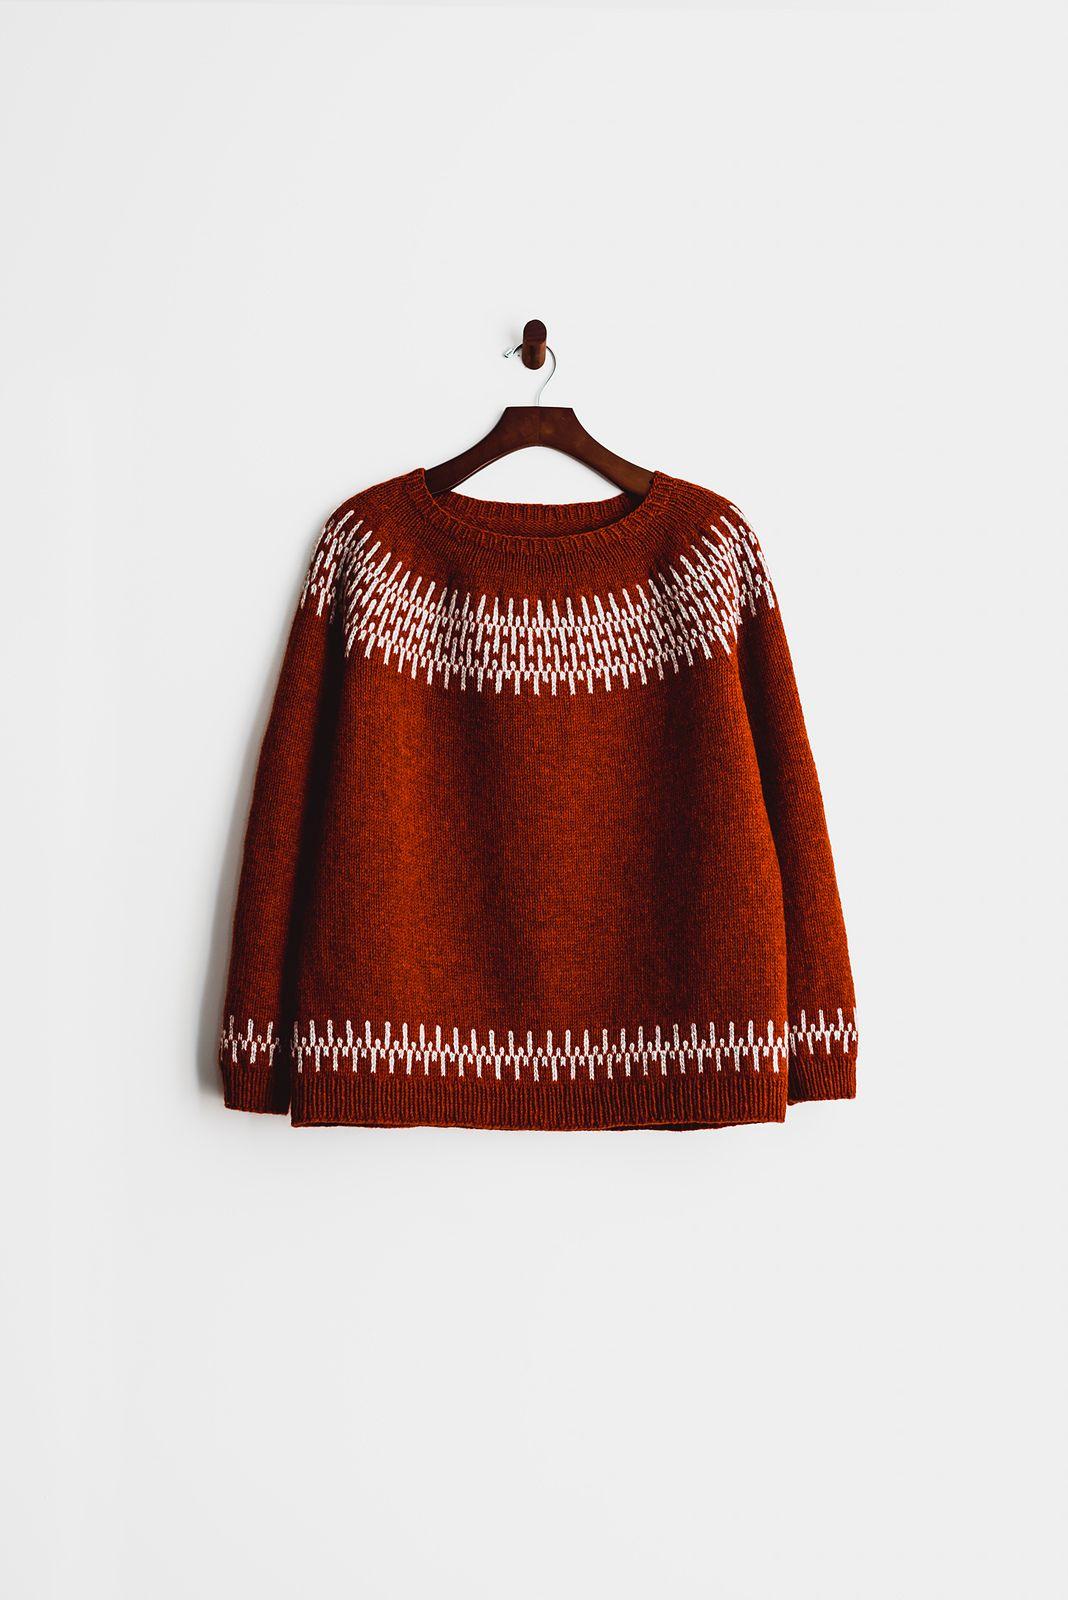 33e66ca59712 Ravelry  amiijjang s Beat Sweater